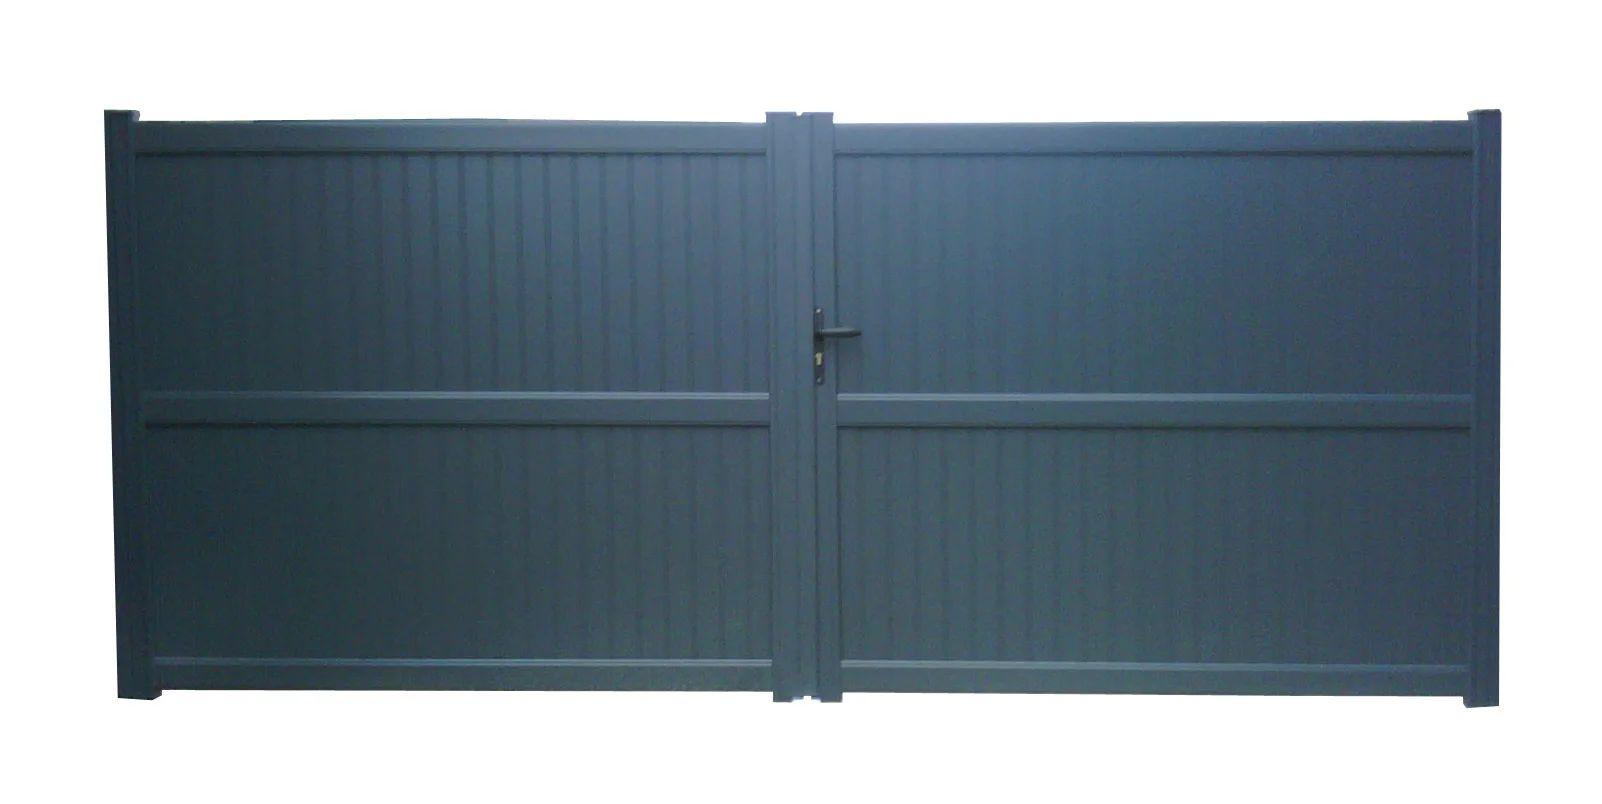 Portail Battant Aluminium Noyal Gris Anthracite Naterial L 299 X H 180 Cm Leroy Merlin